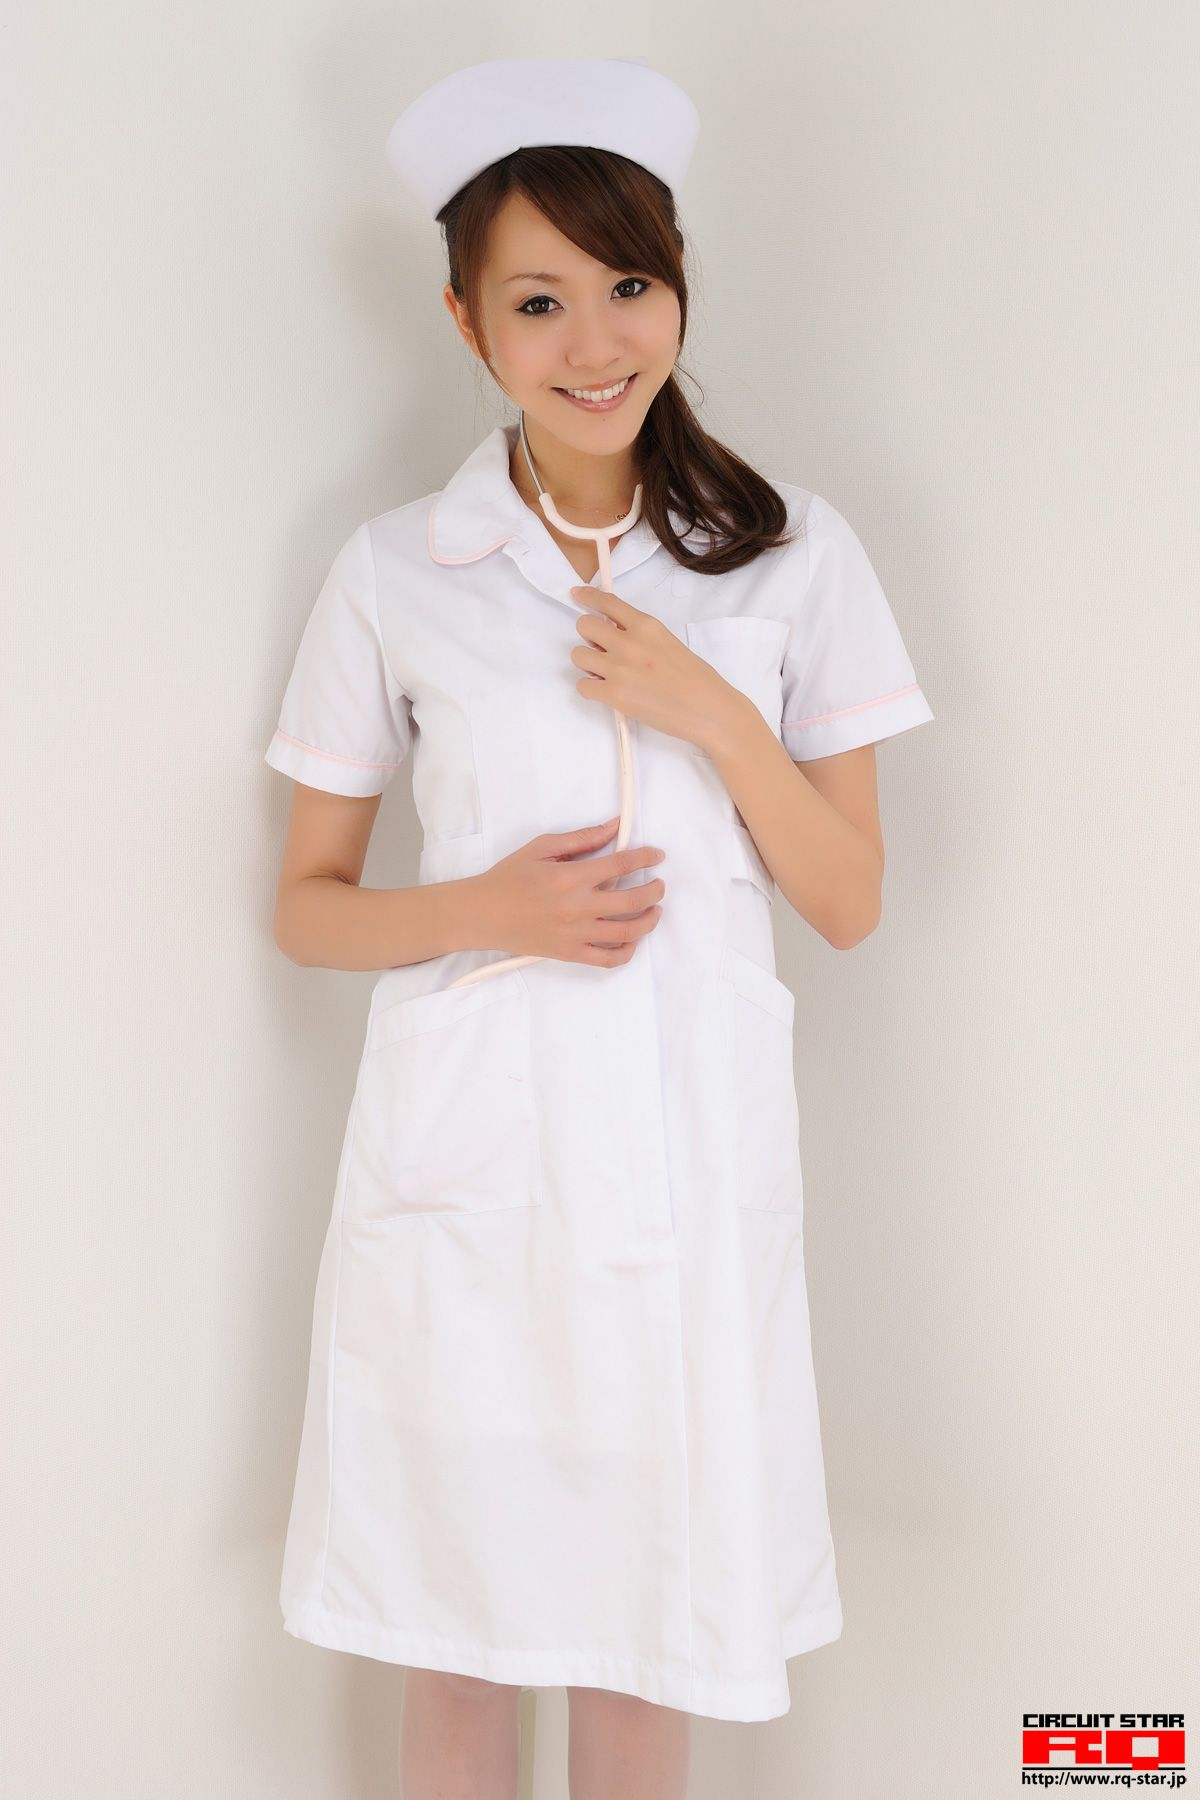 [RQ STAR美女] NO.0427 Saki Ueda 植田早紀 Nurse Costume[83P] RQ STAR 第3张